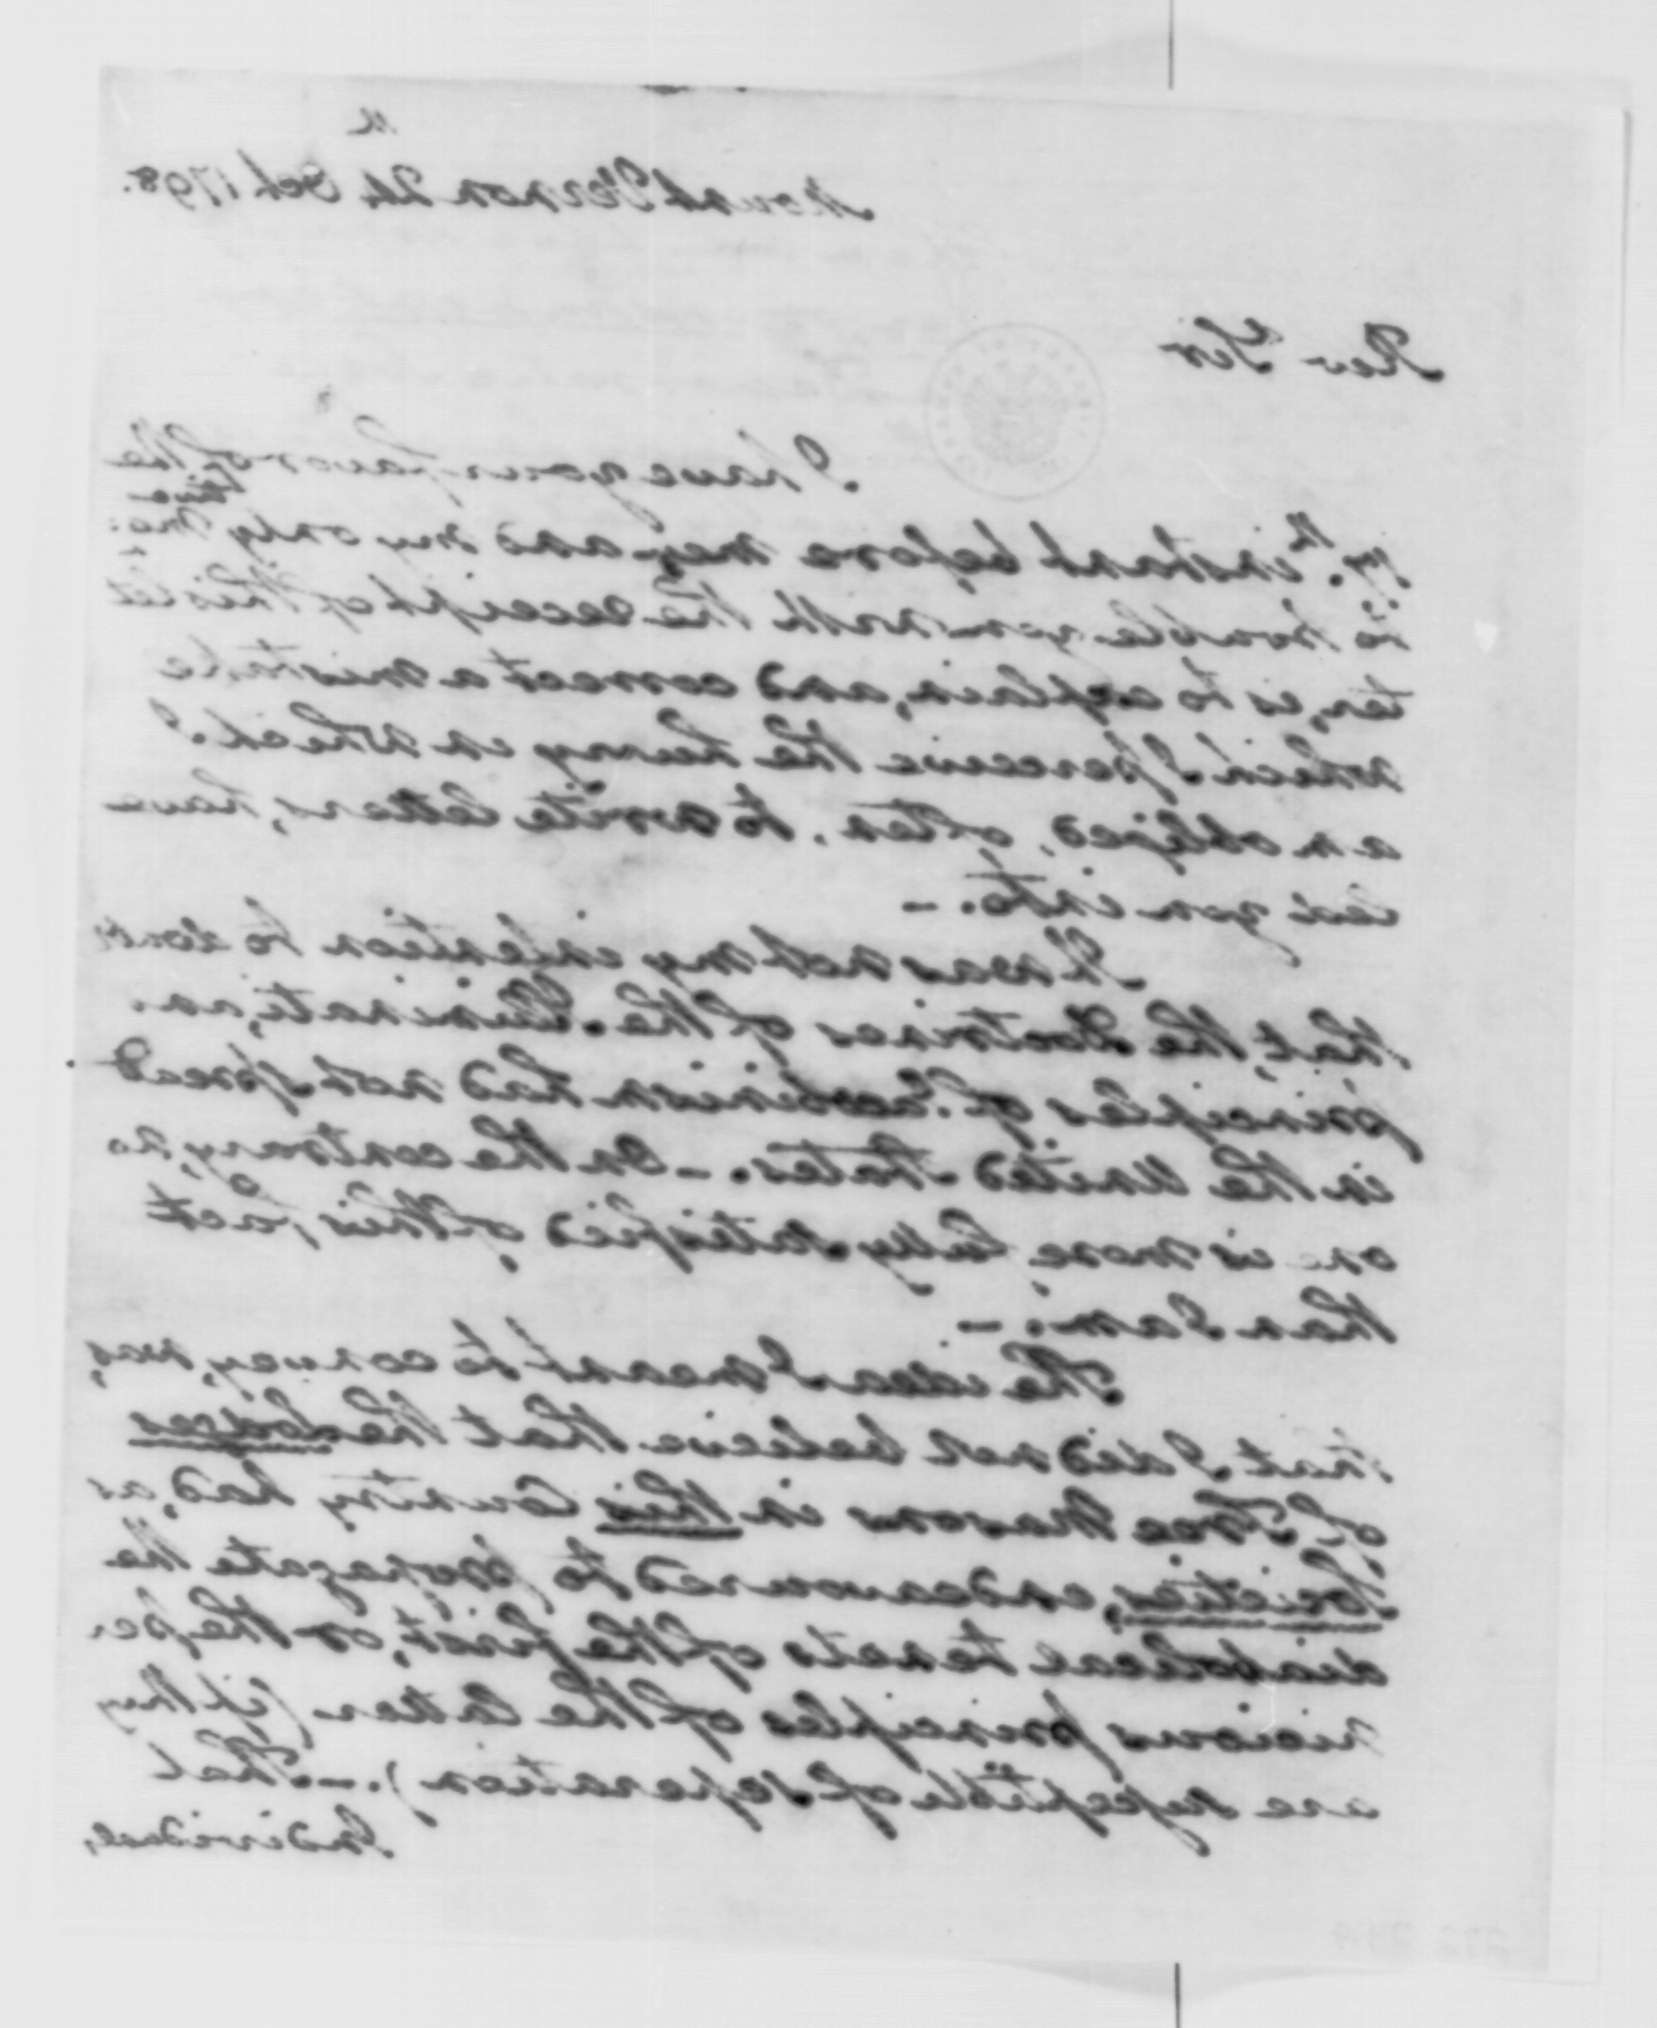 George Washington Illuminati Letter Oct 24th, 1798 - image 2 of 4